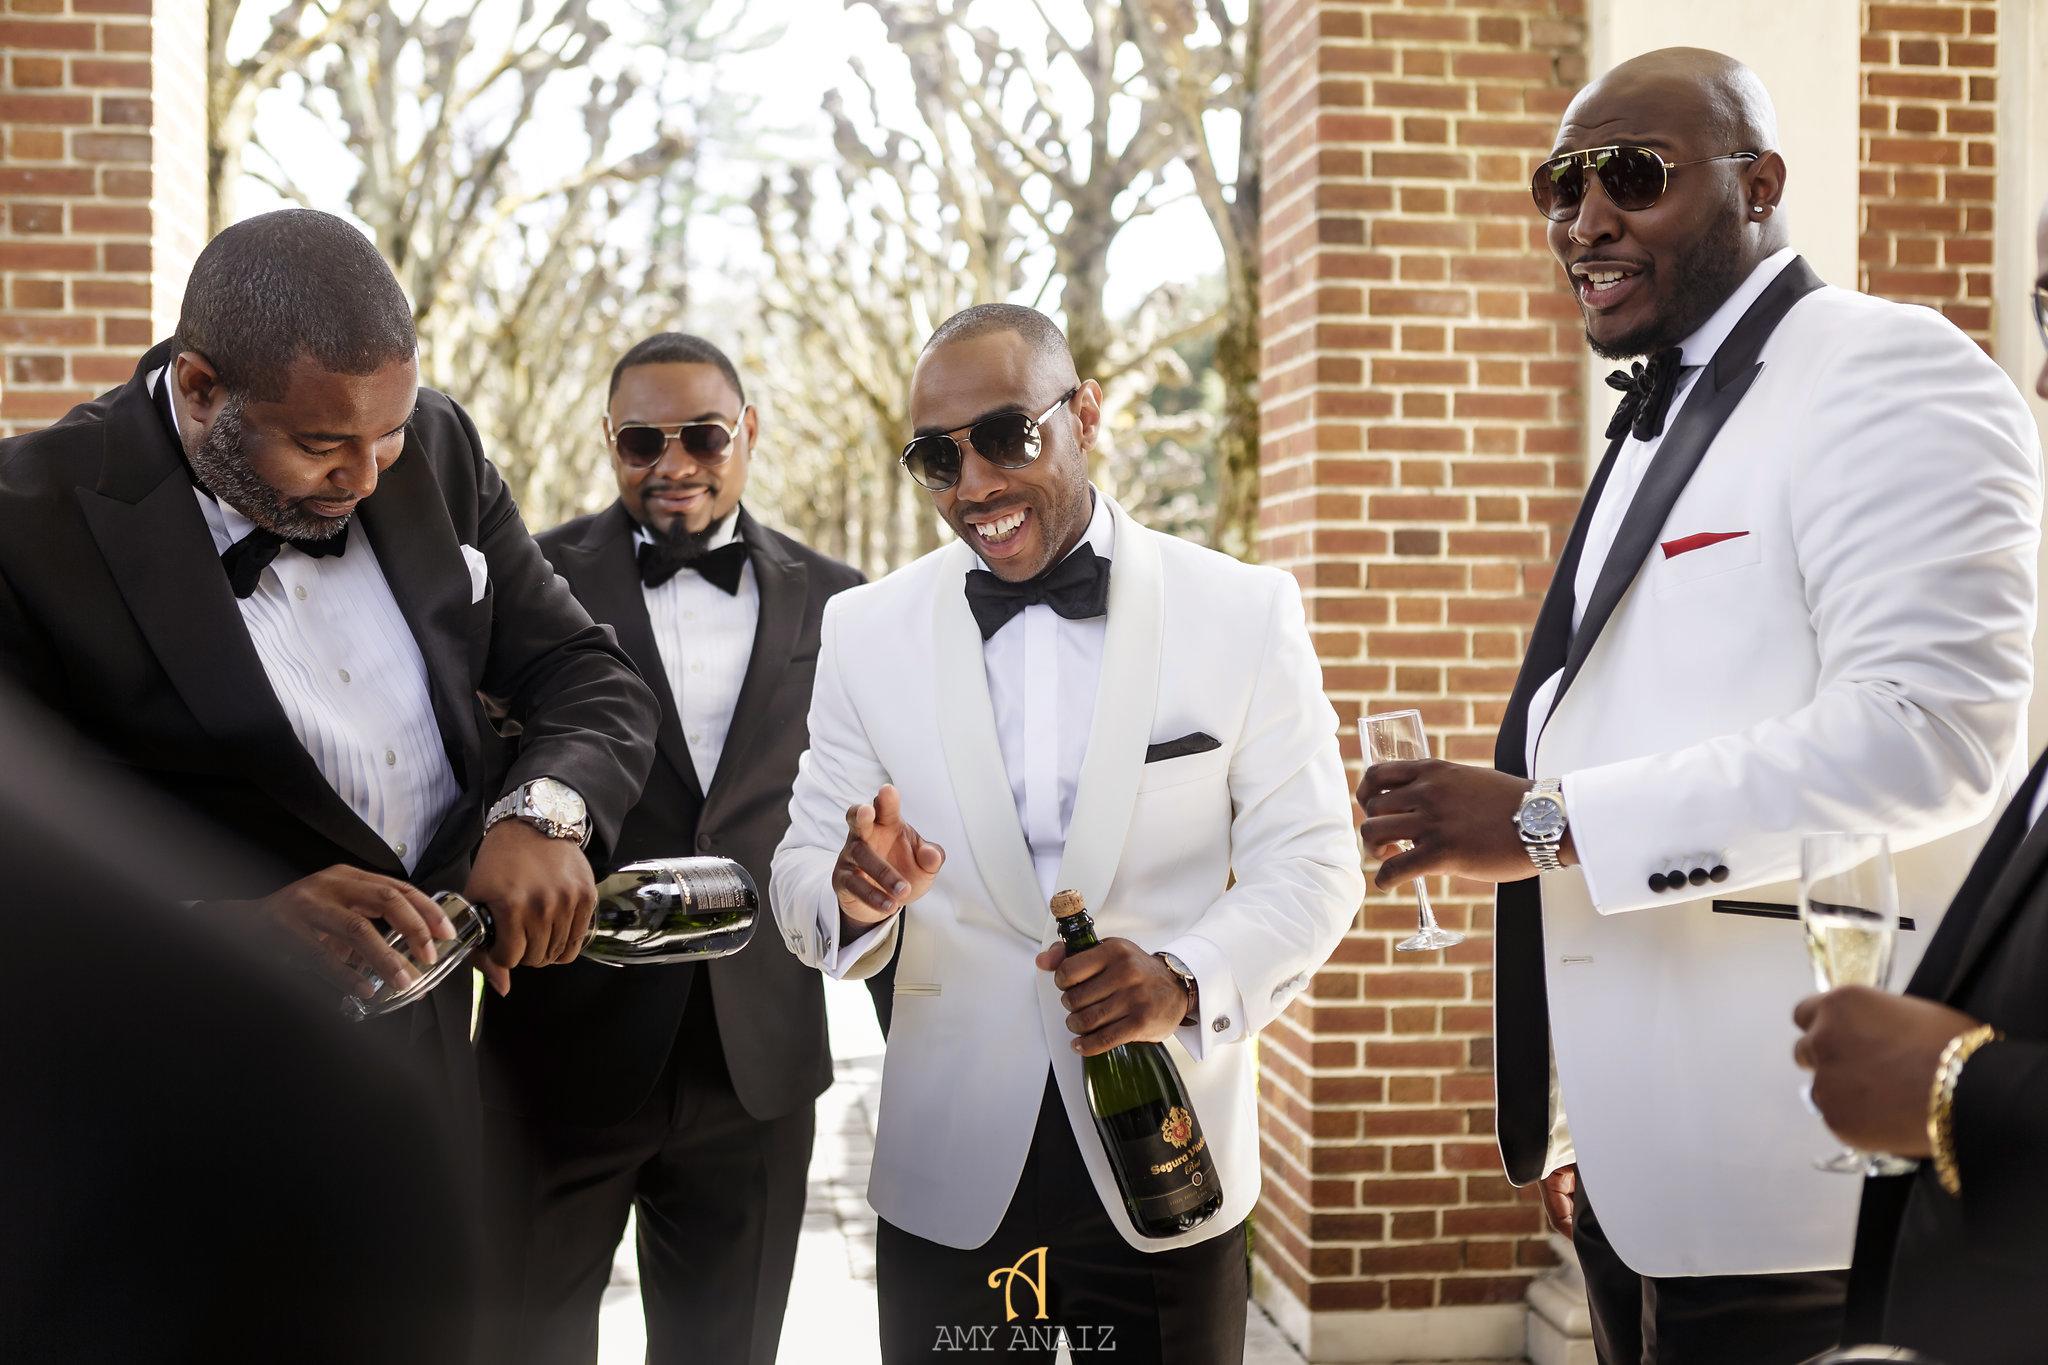 NYIT de Serversky Mansion, Groom and Groomsmen, Long Island Wedding.JPG